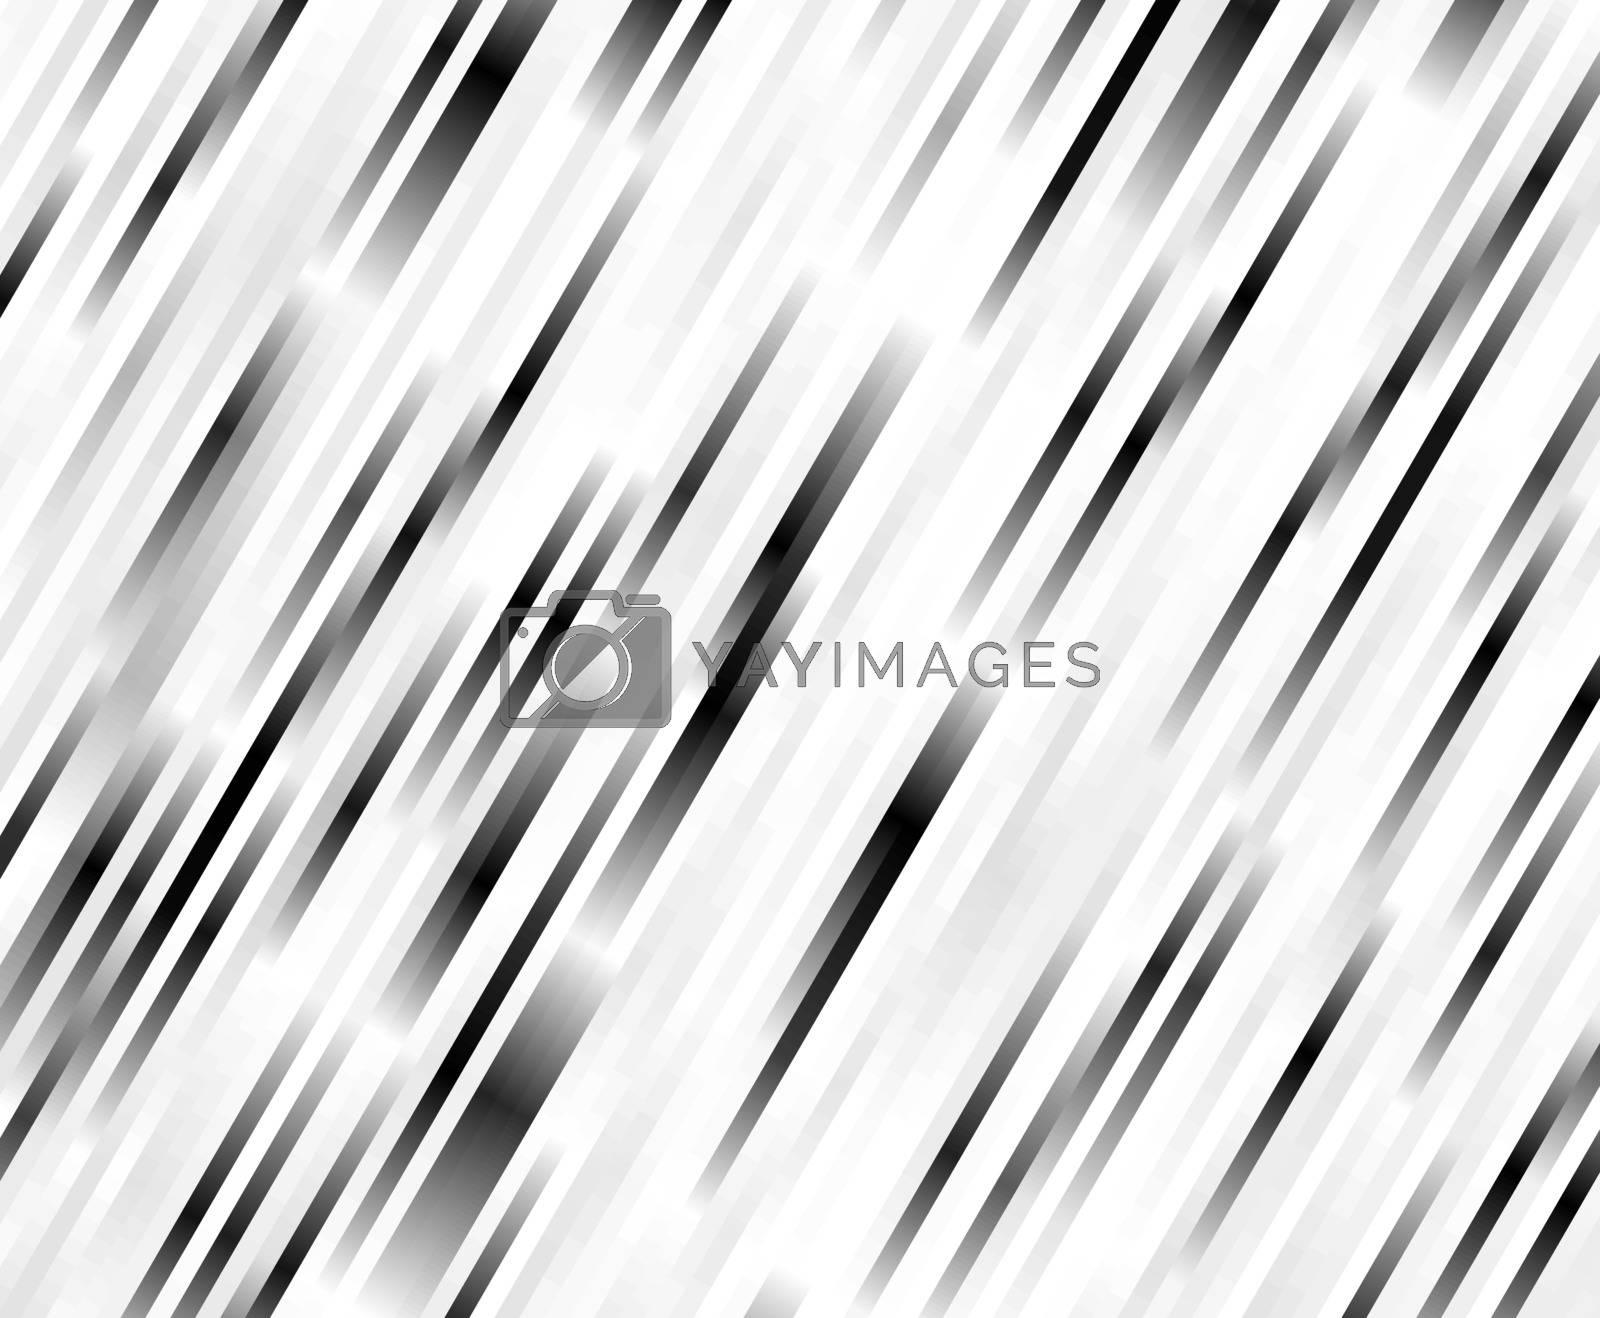 black and white diagonal stripes background